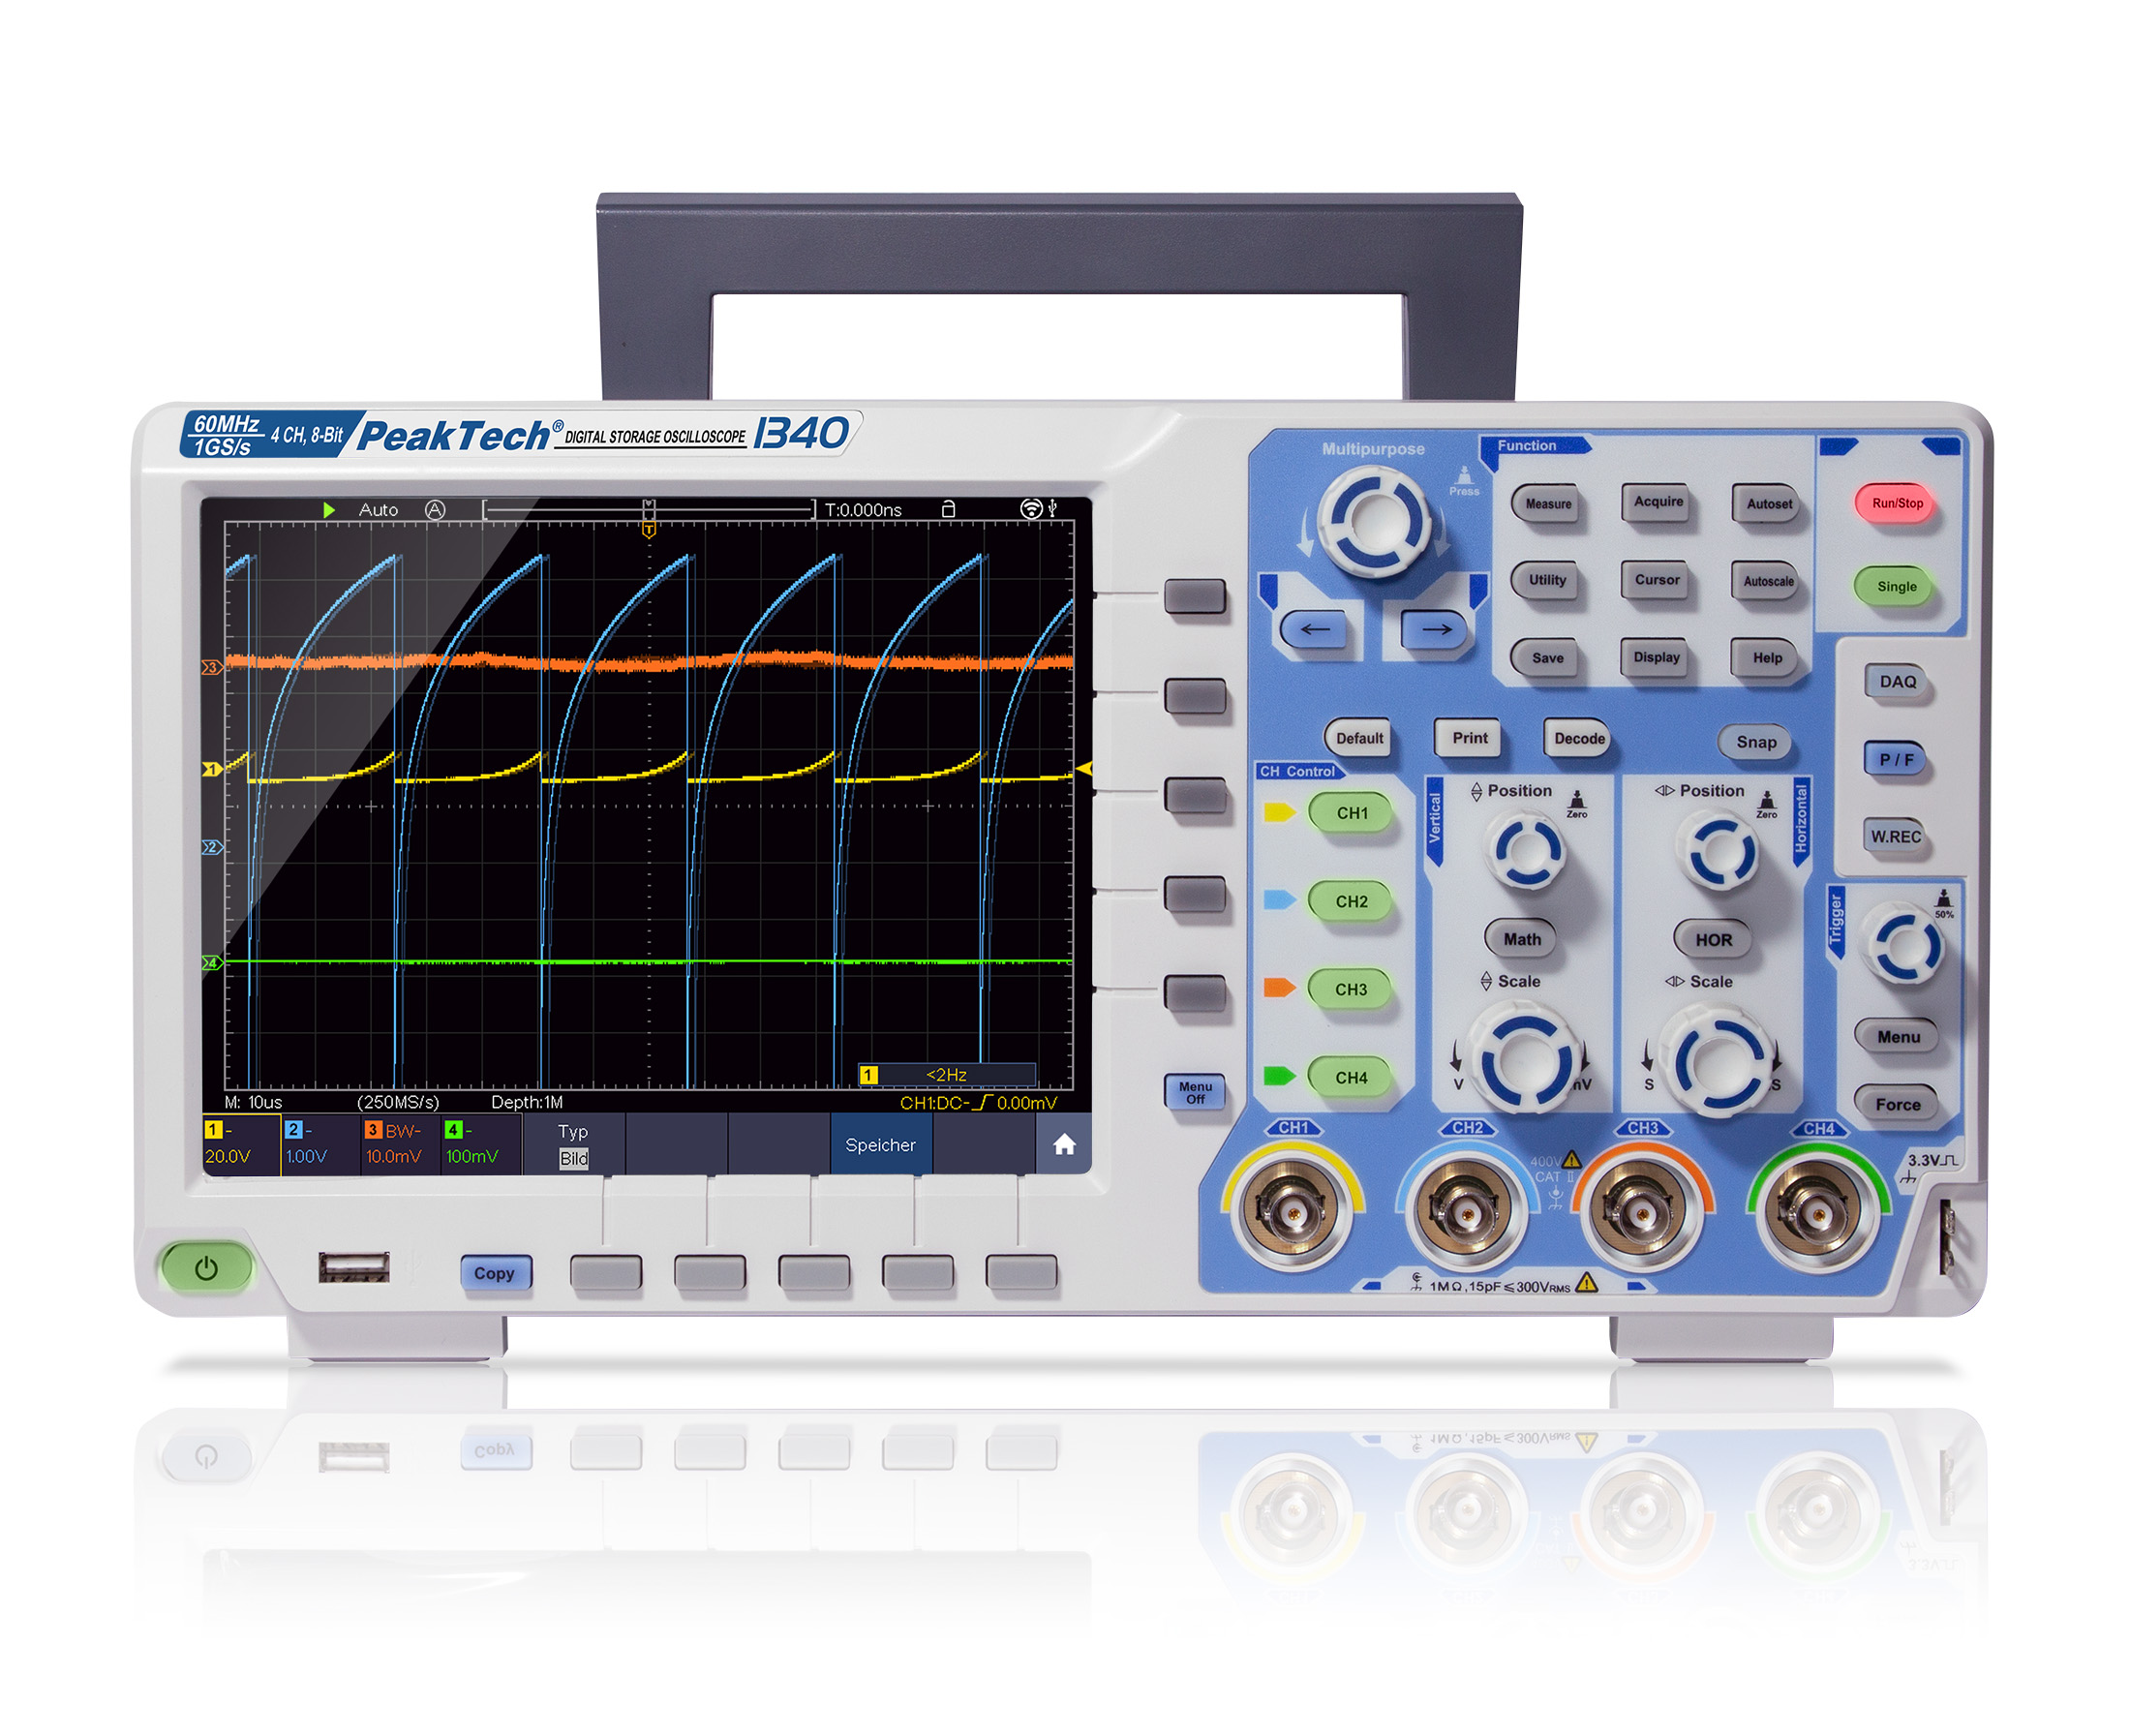 «PeakTech® P 1340» 60 MHz / 4 CH, 1 GS/s digital storage oscilloscope